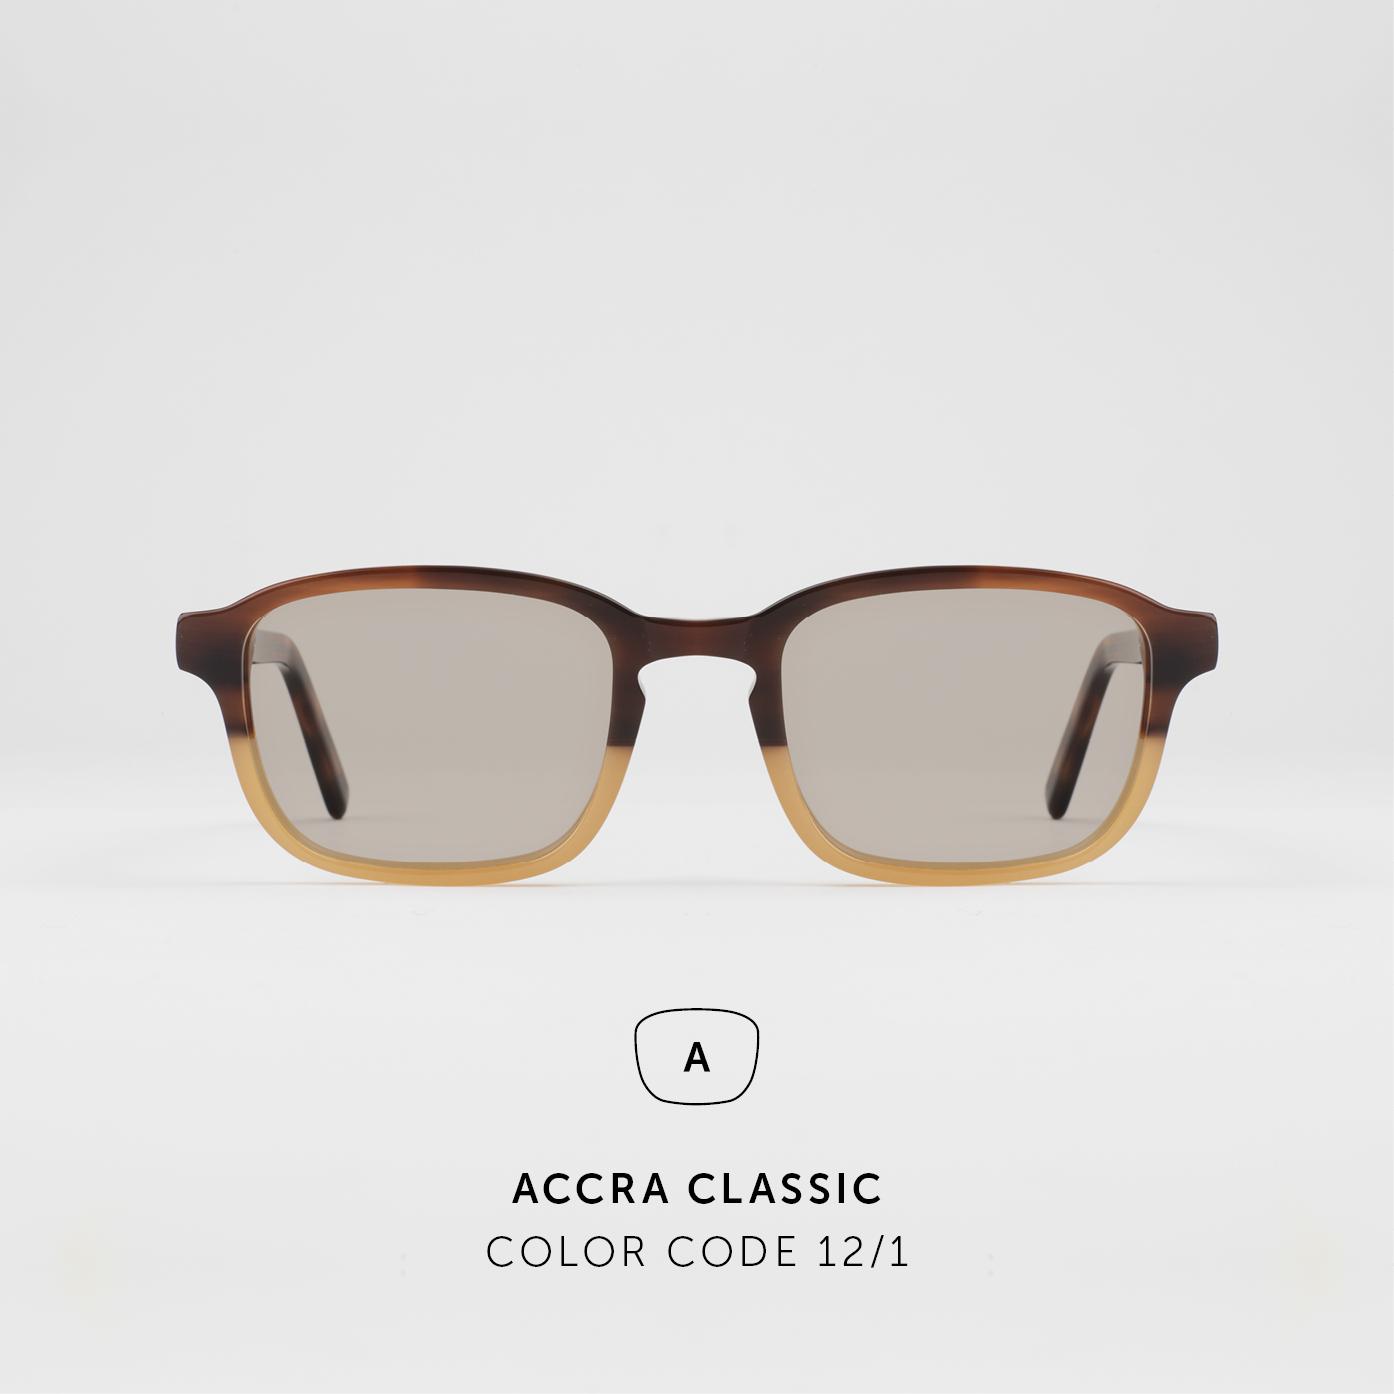 AccraClassic40.jpg